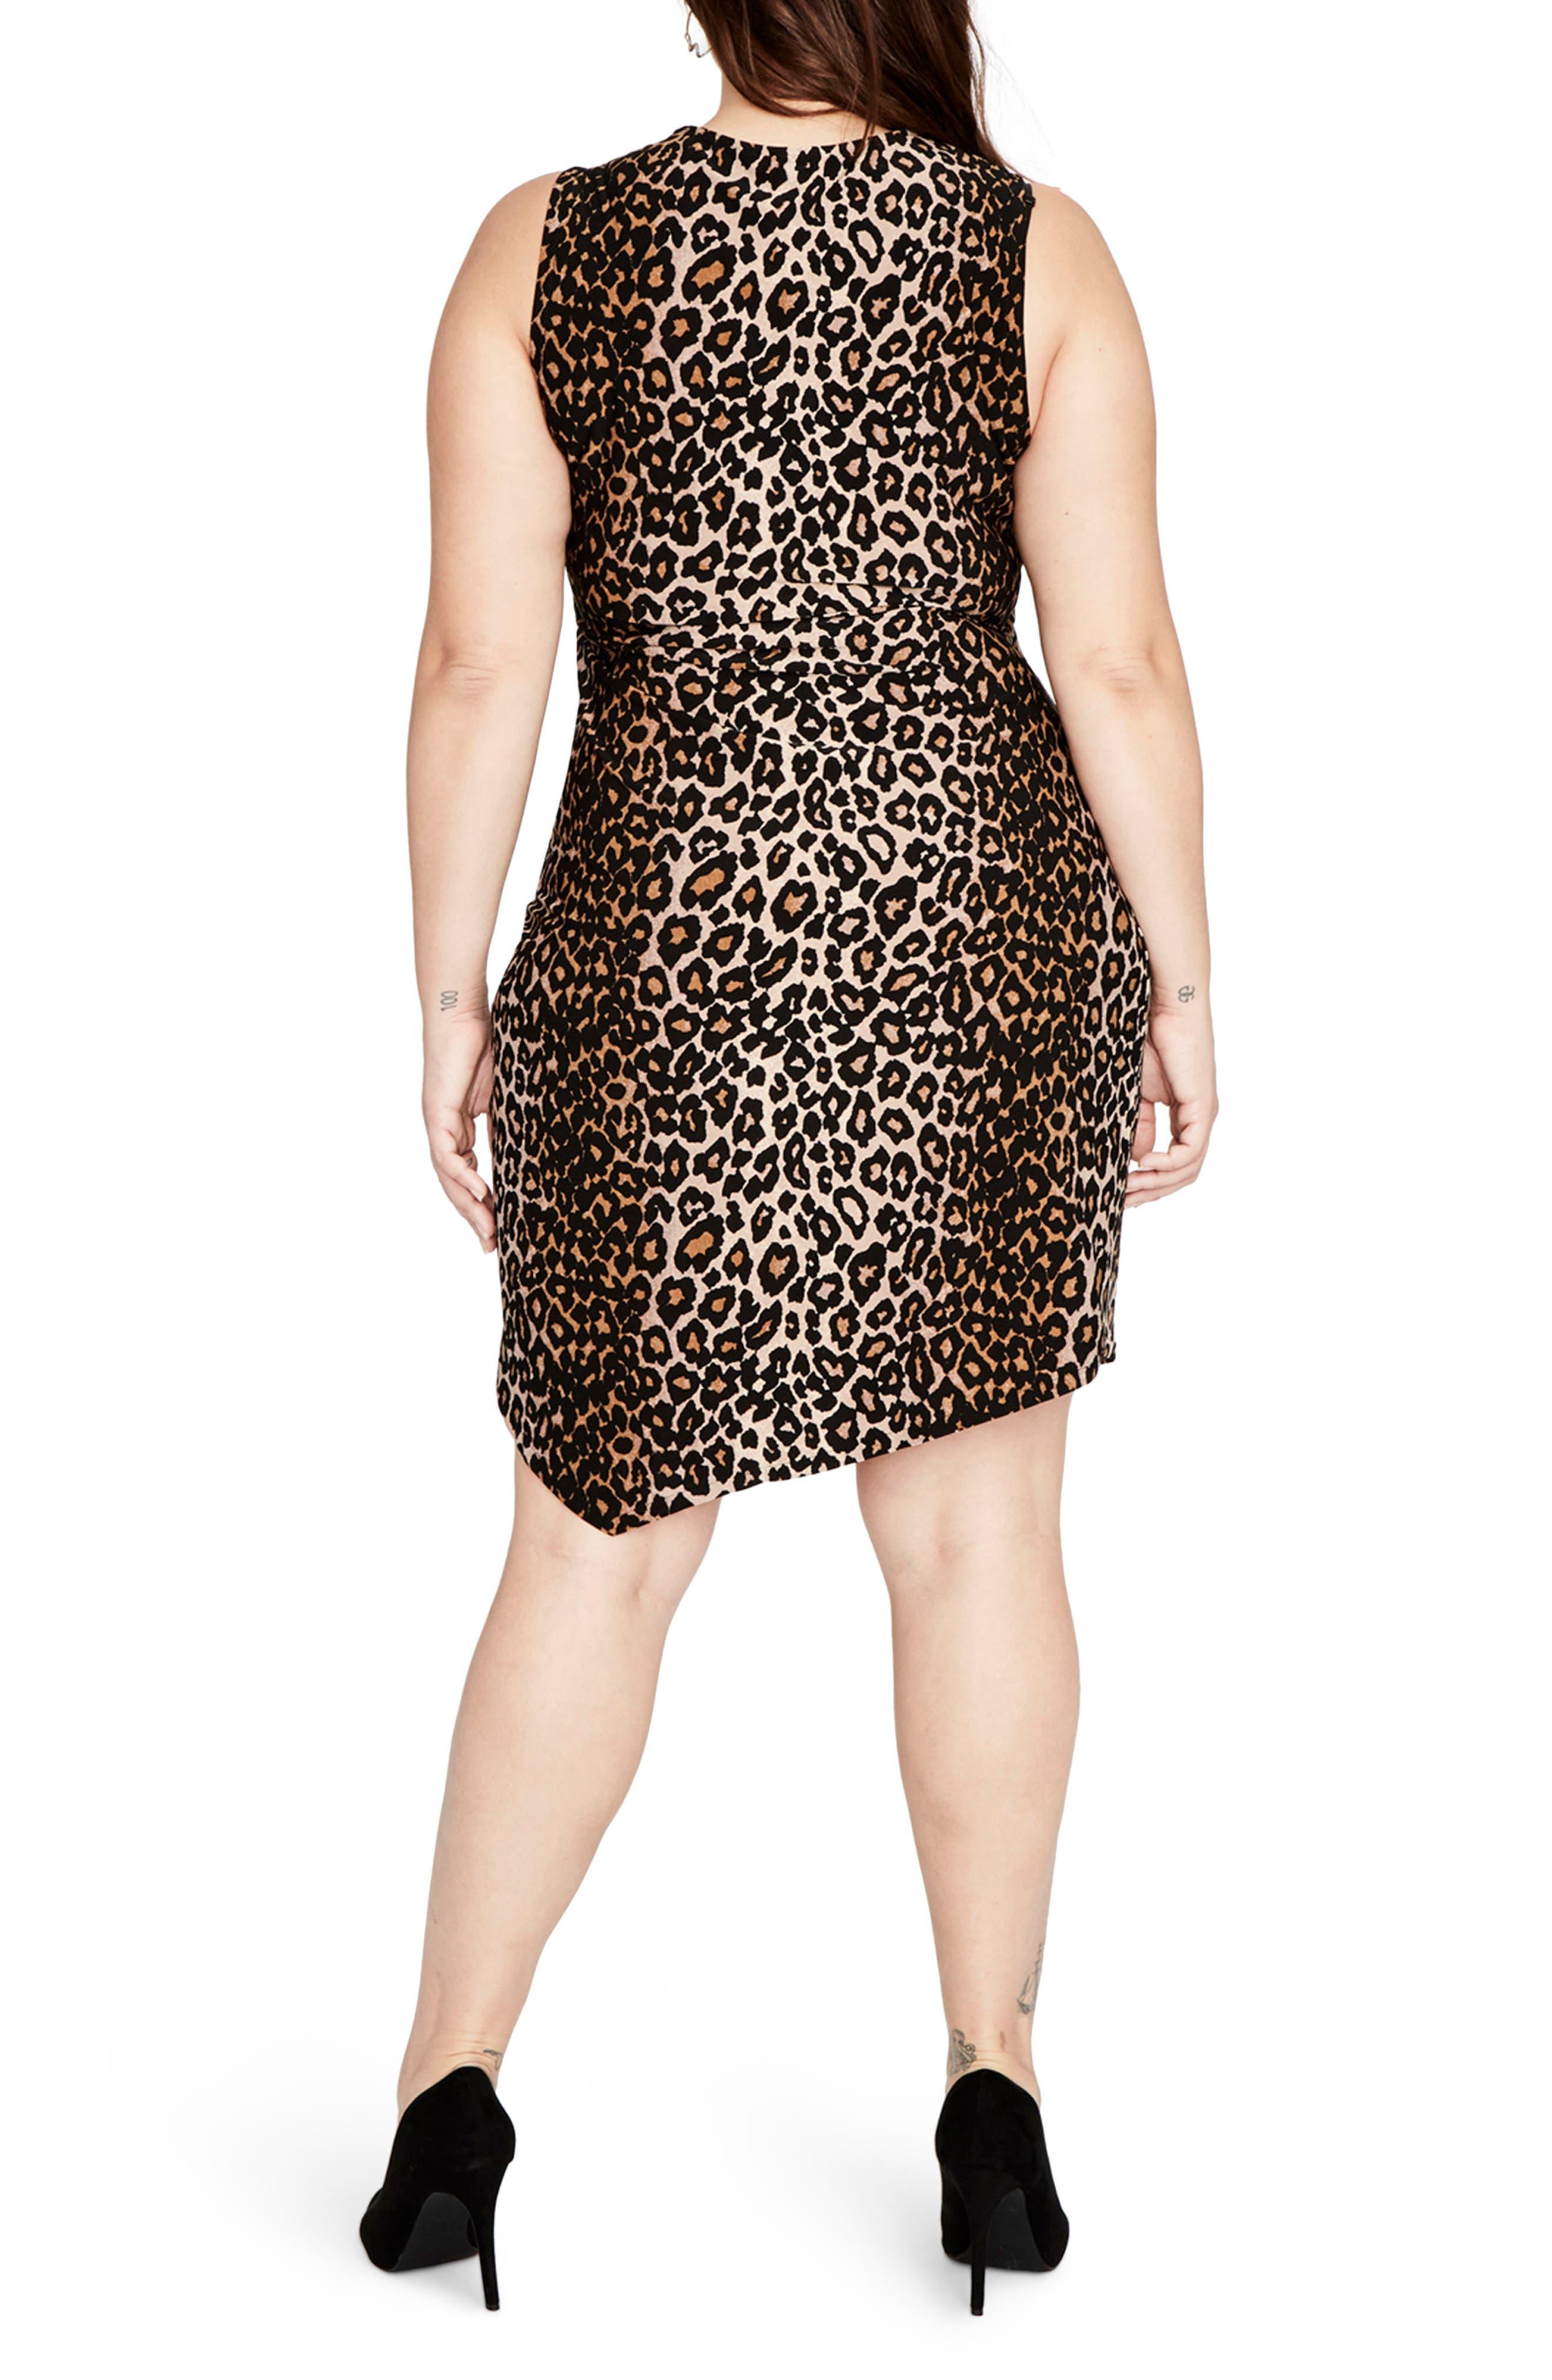 RACHEL BY Rachel Roy Leopard Print Asymmetrical Drape Dress,                             Alternate thumbnail 2, color,                             270